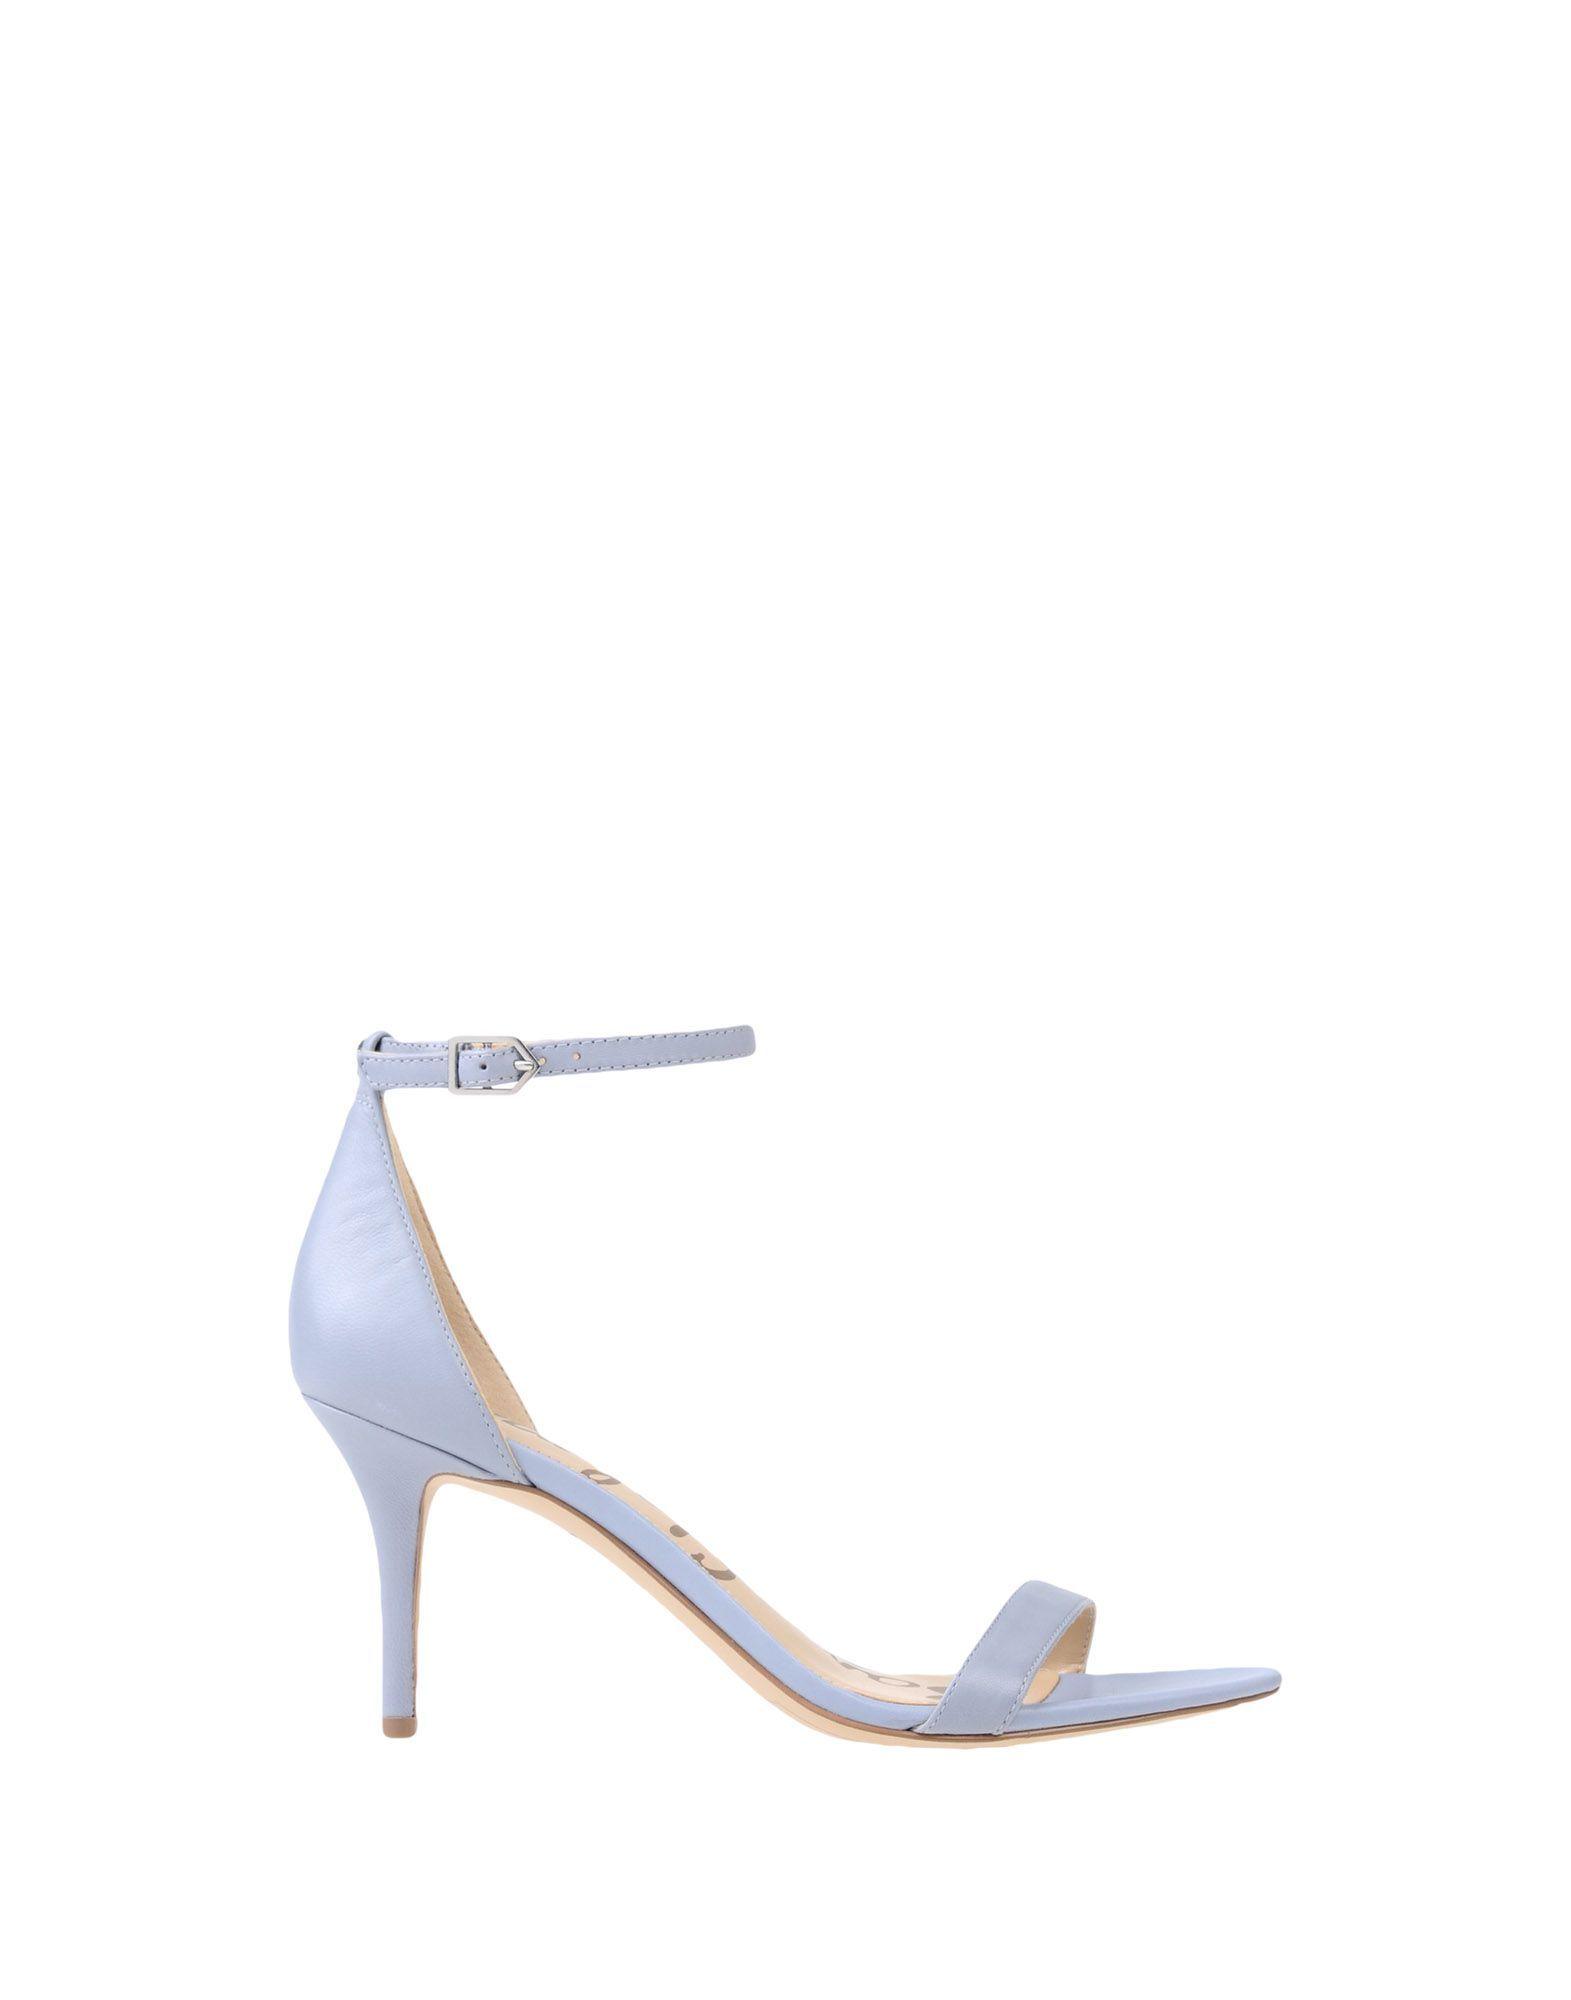 Sam Edelman Grey Leather Heeled Sandals